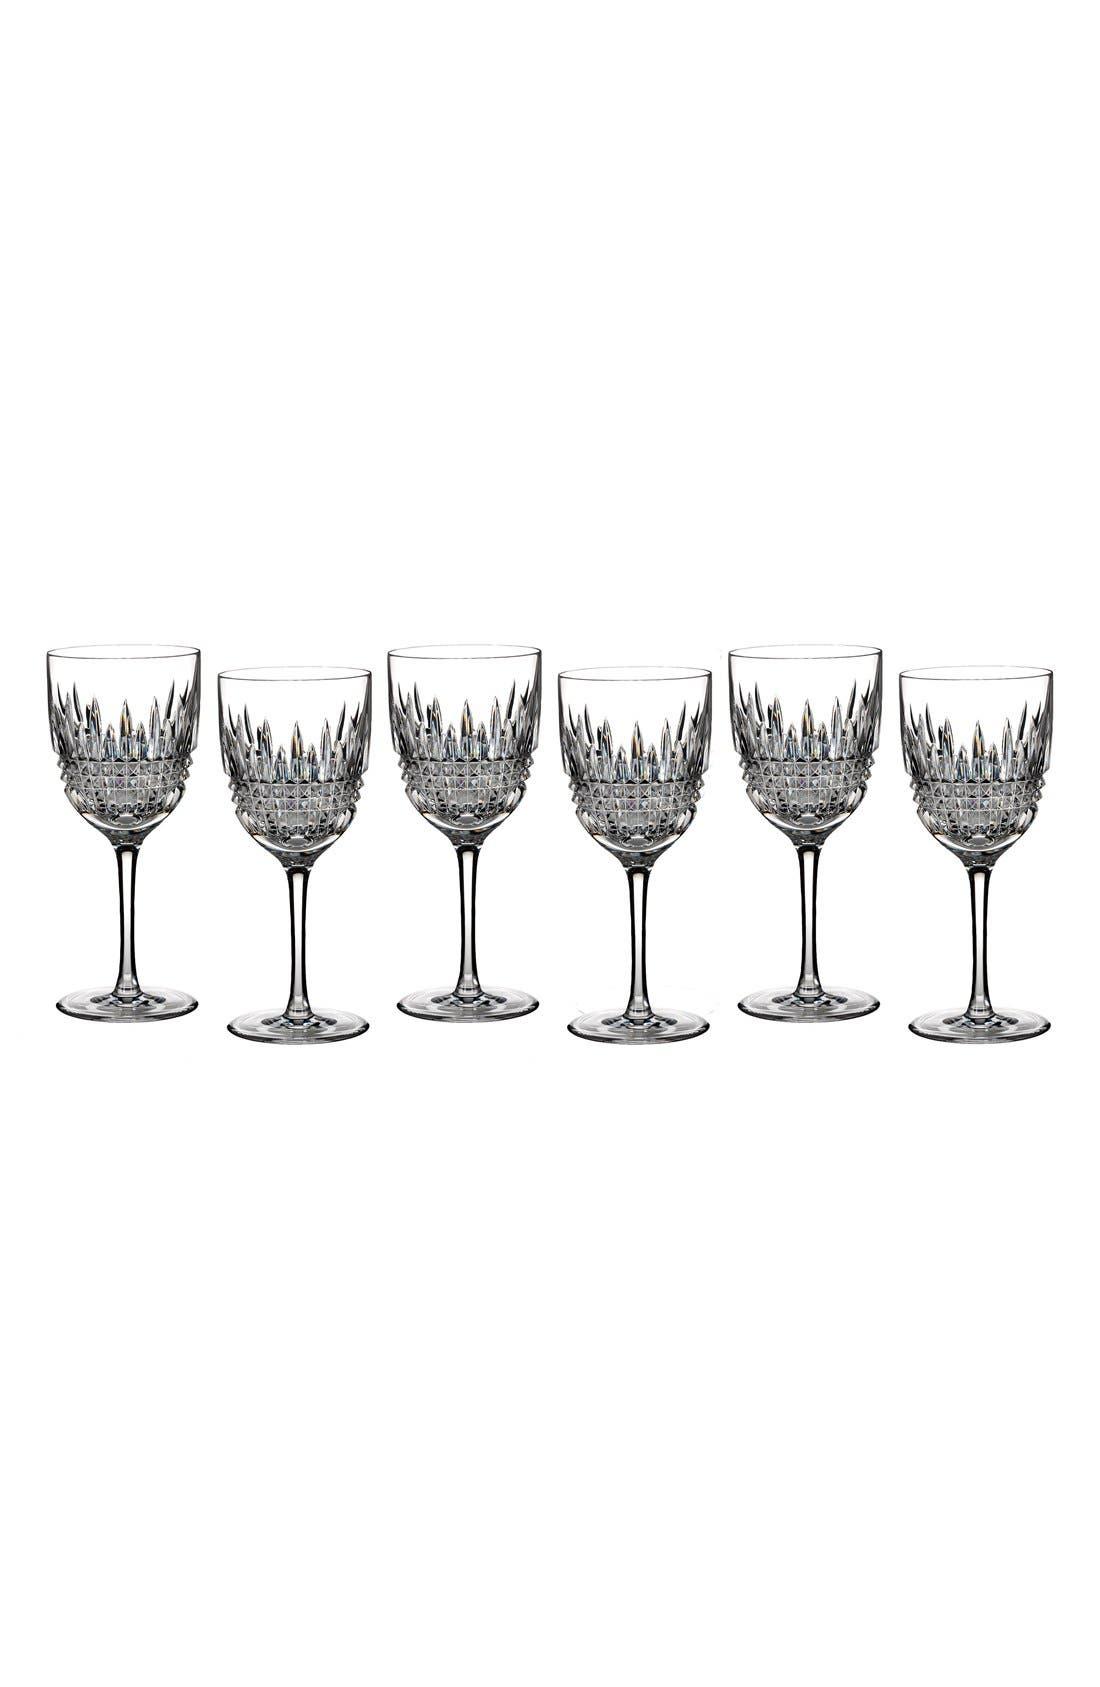 Waterford Lismore Diamond Set of 6 Lead Crystal White Wine Glasses